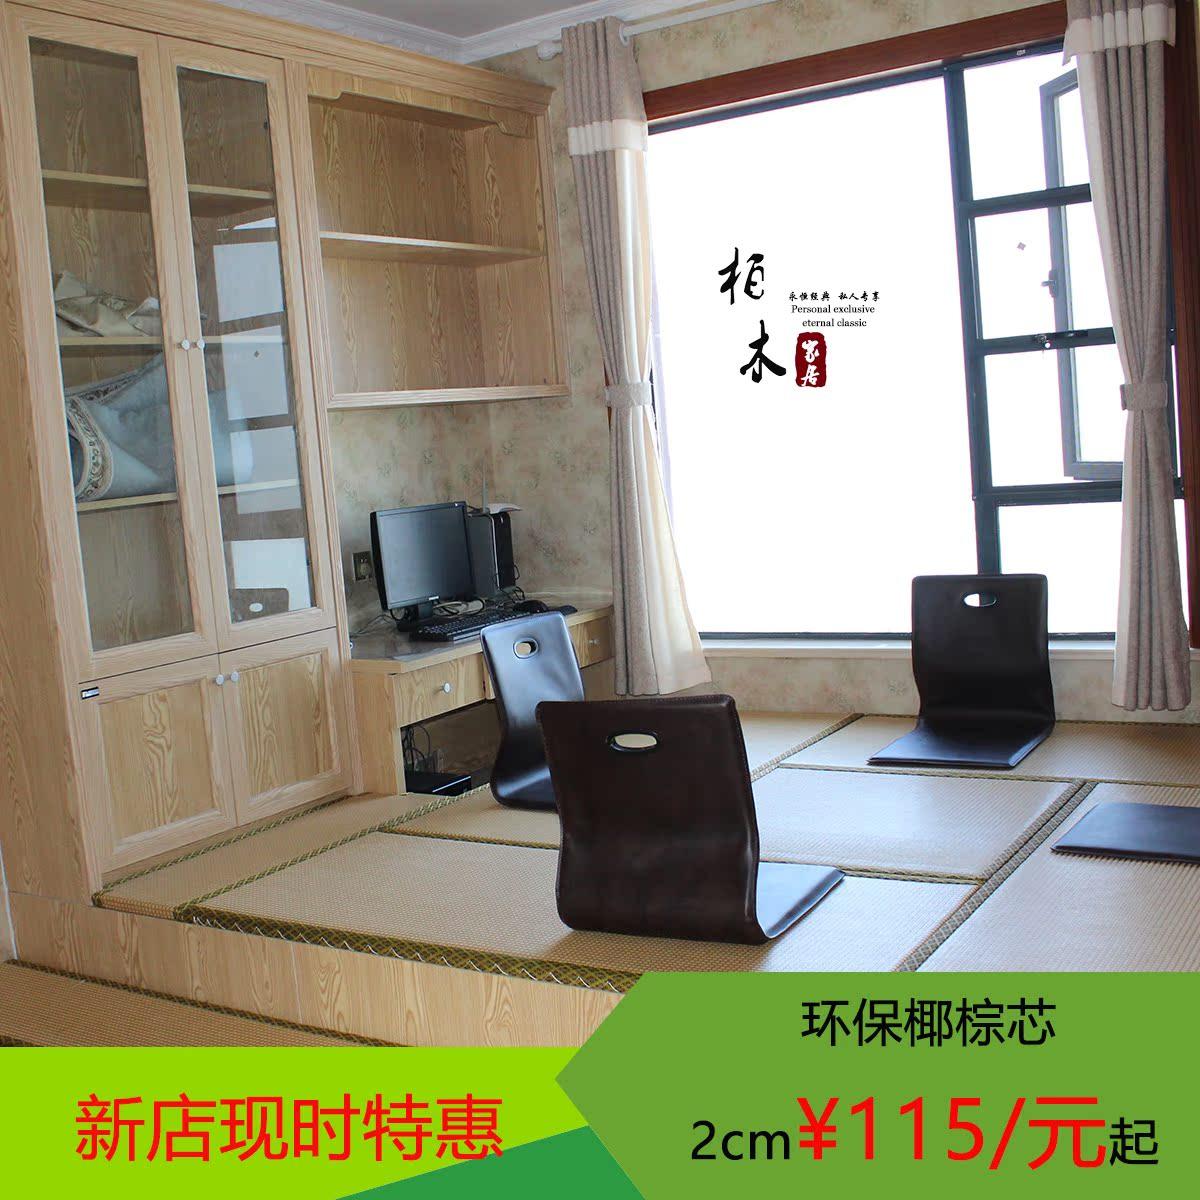 Tatami mats made of coconut tatami mattress bedroom tatami cushions pad mat Piaochuang platform